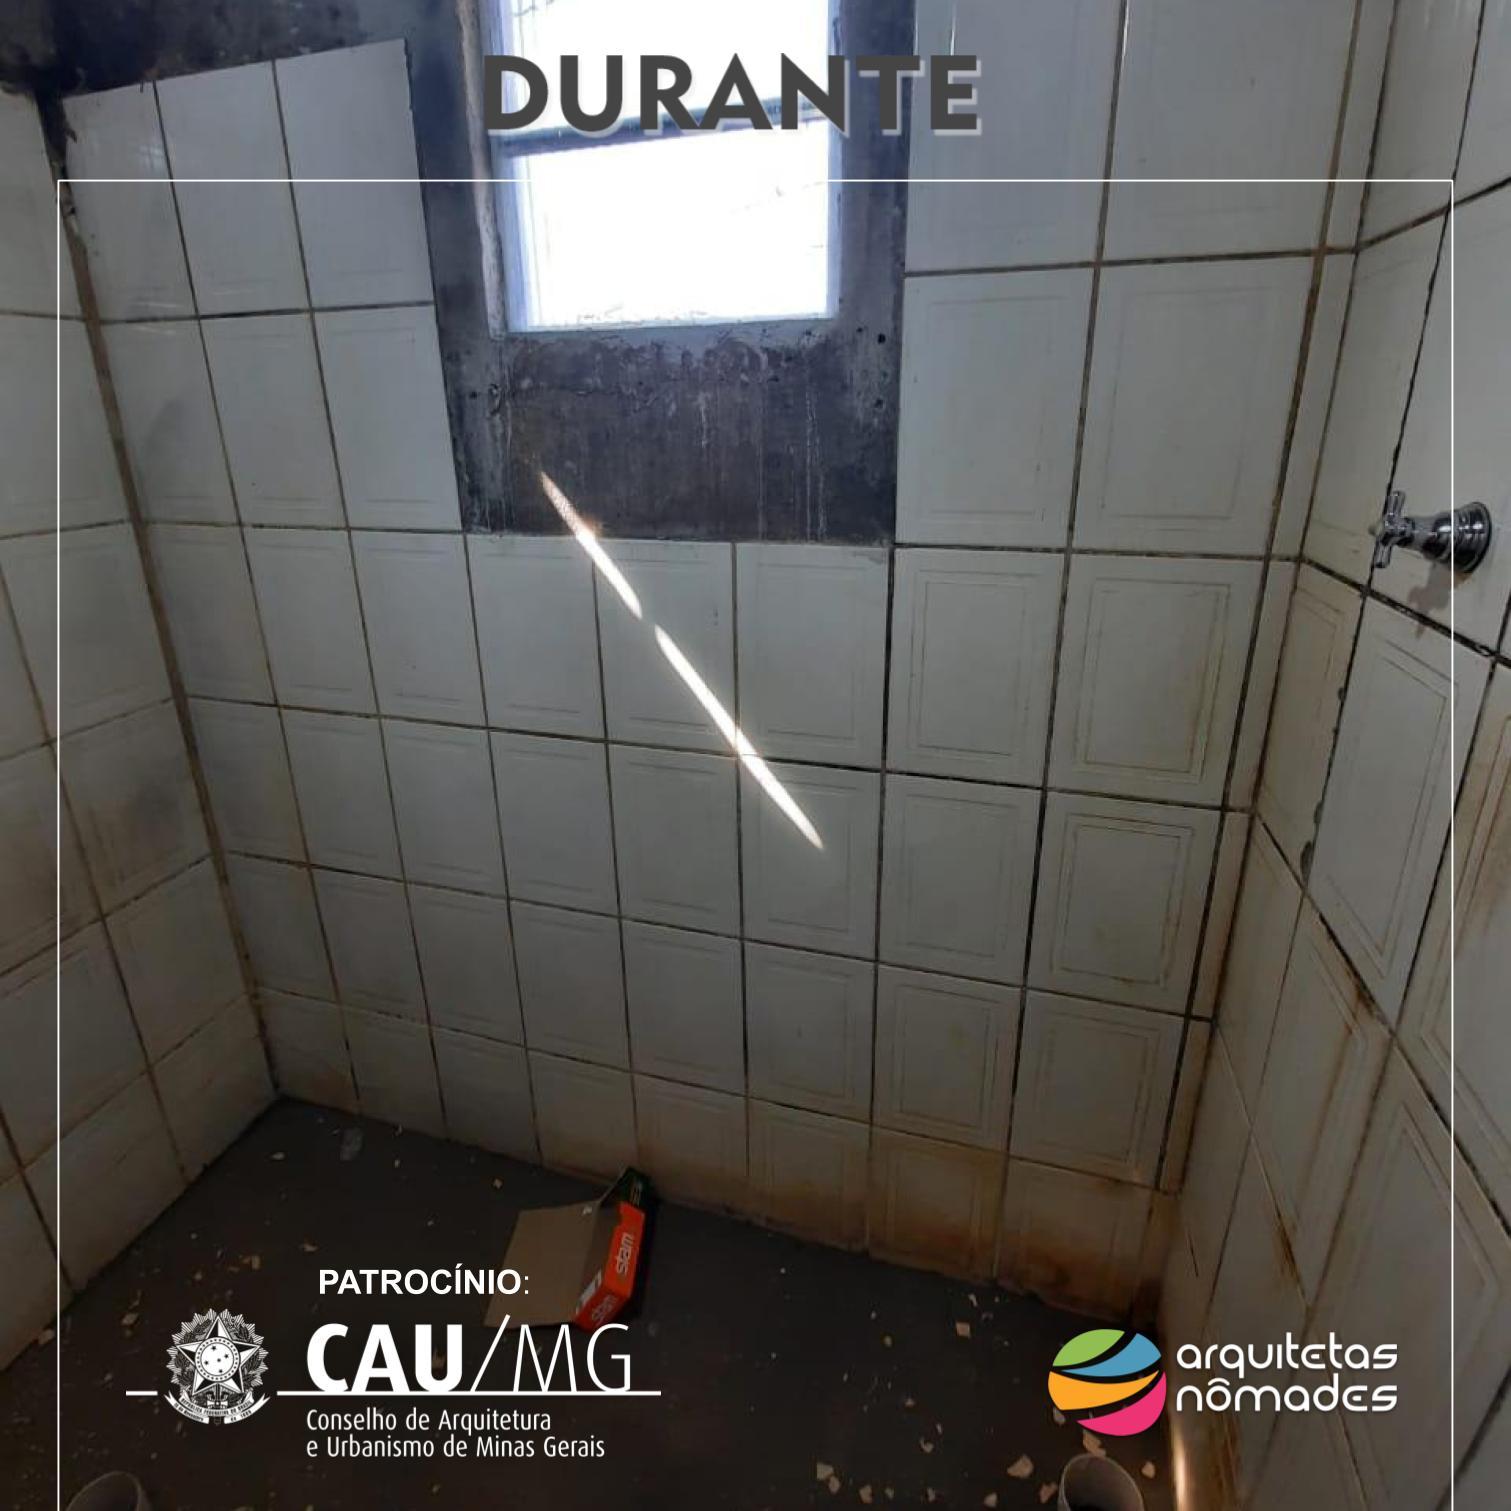 DURANTE2